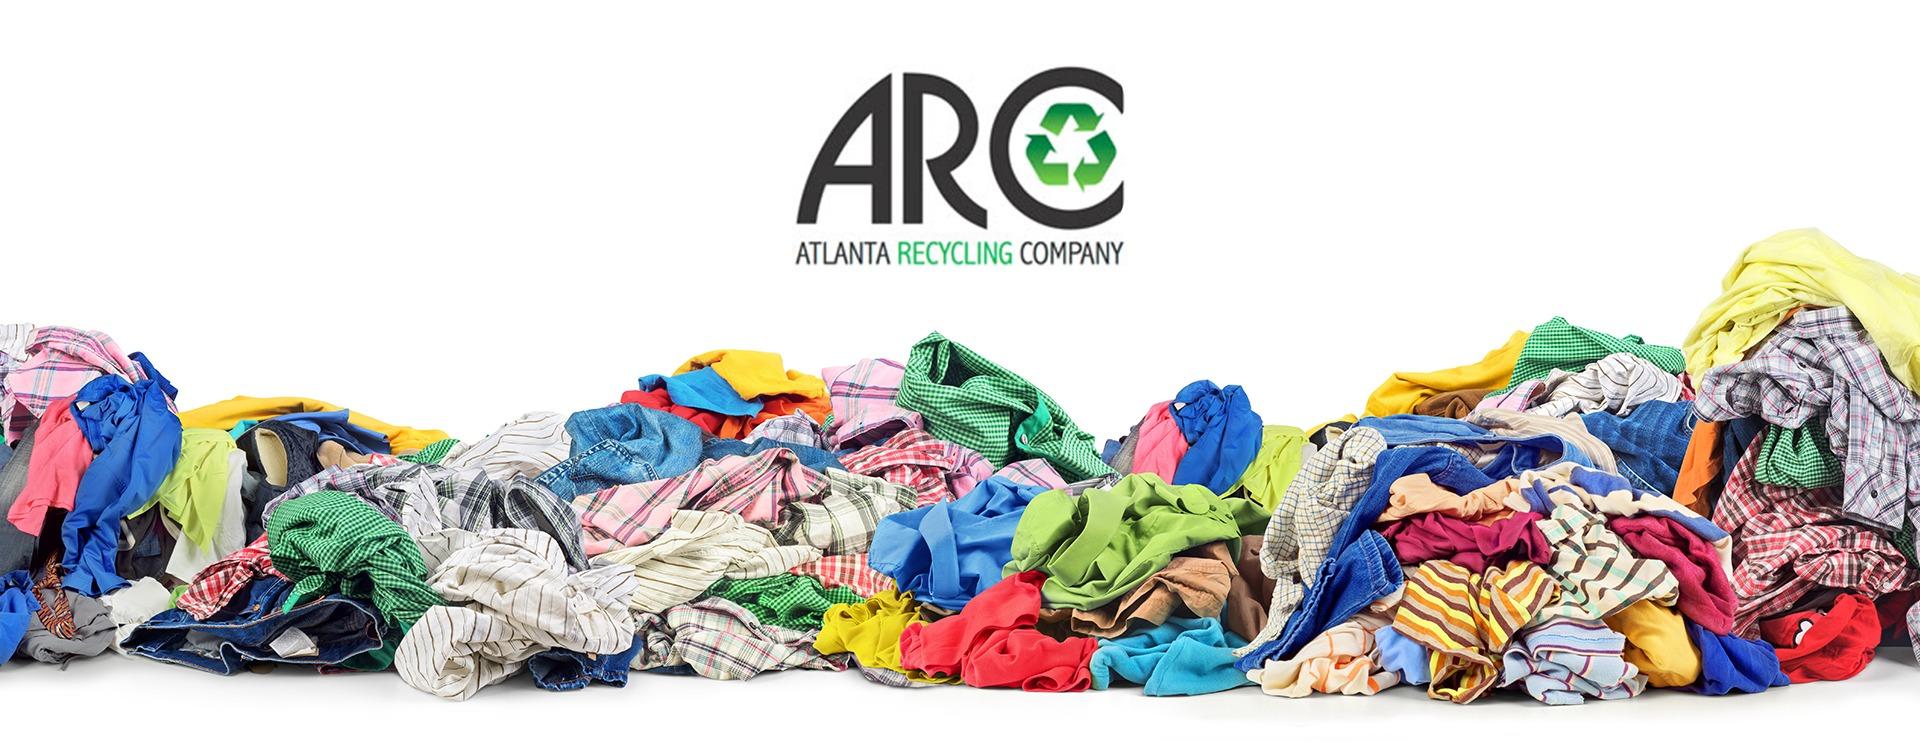 Atlanta Recycling Company's Quick Base ERP Application